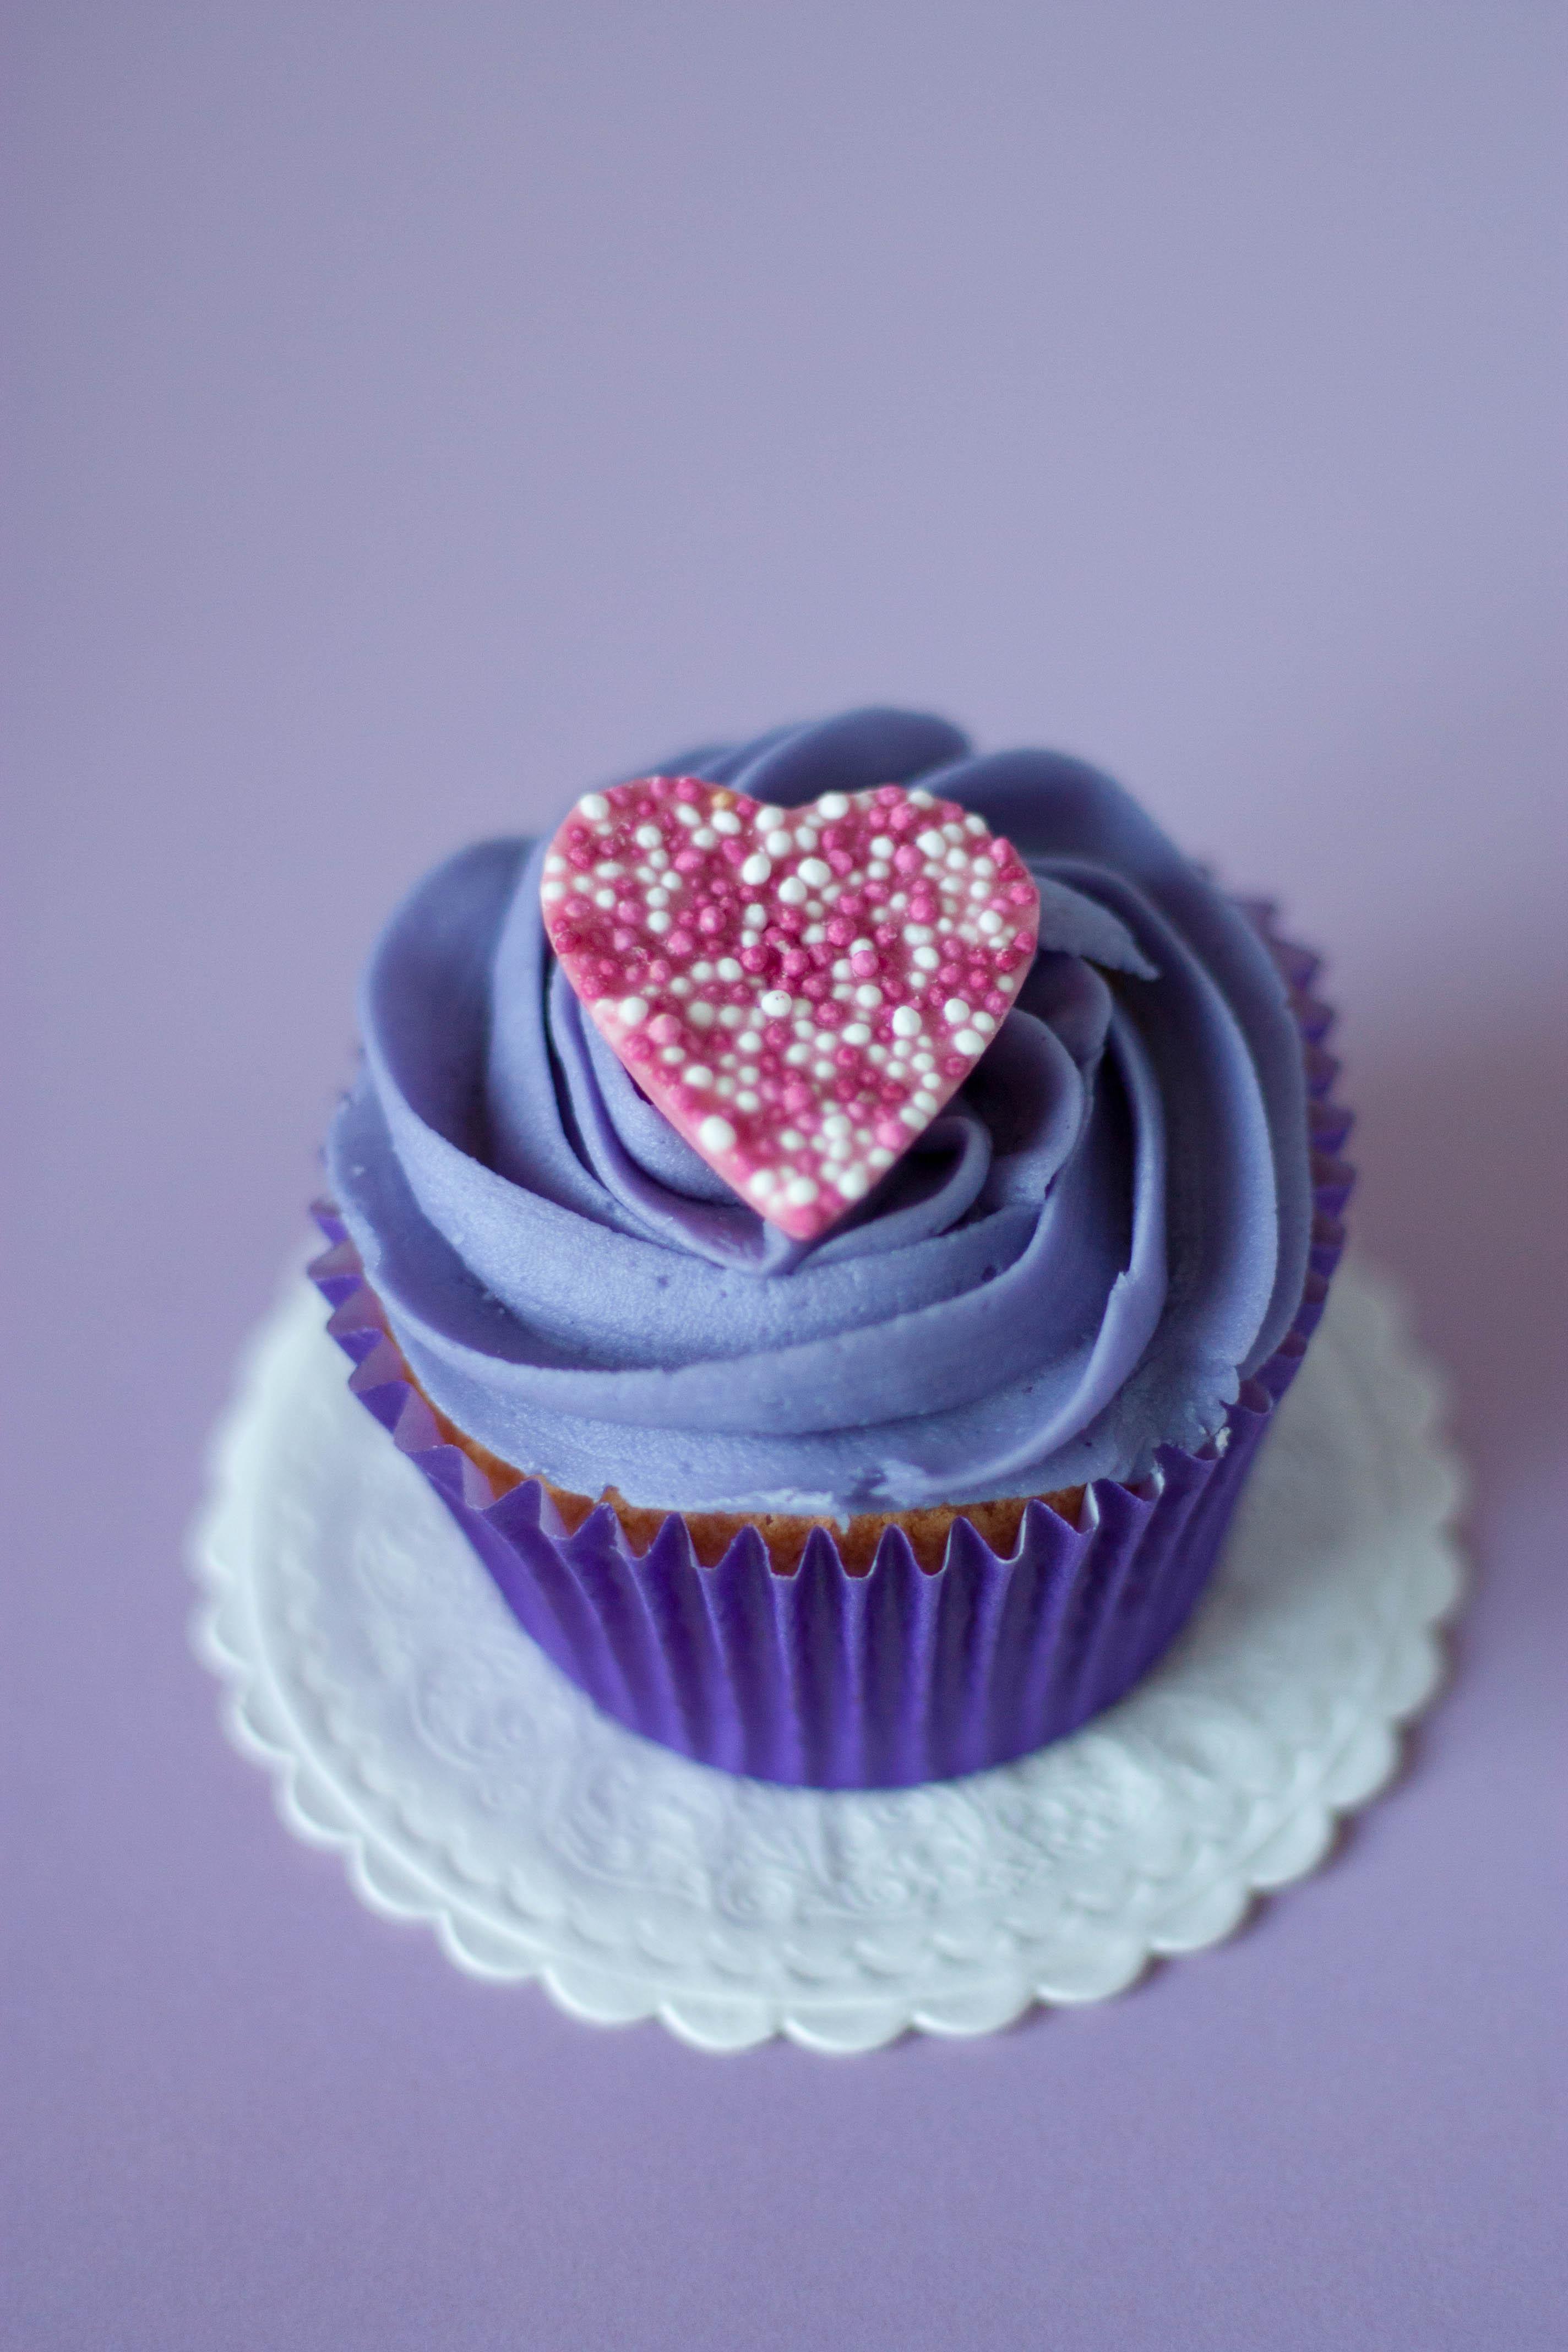 Free Images sweet flower purple petal heart food blue pink